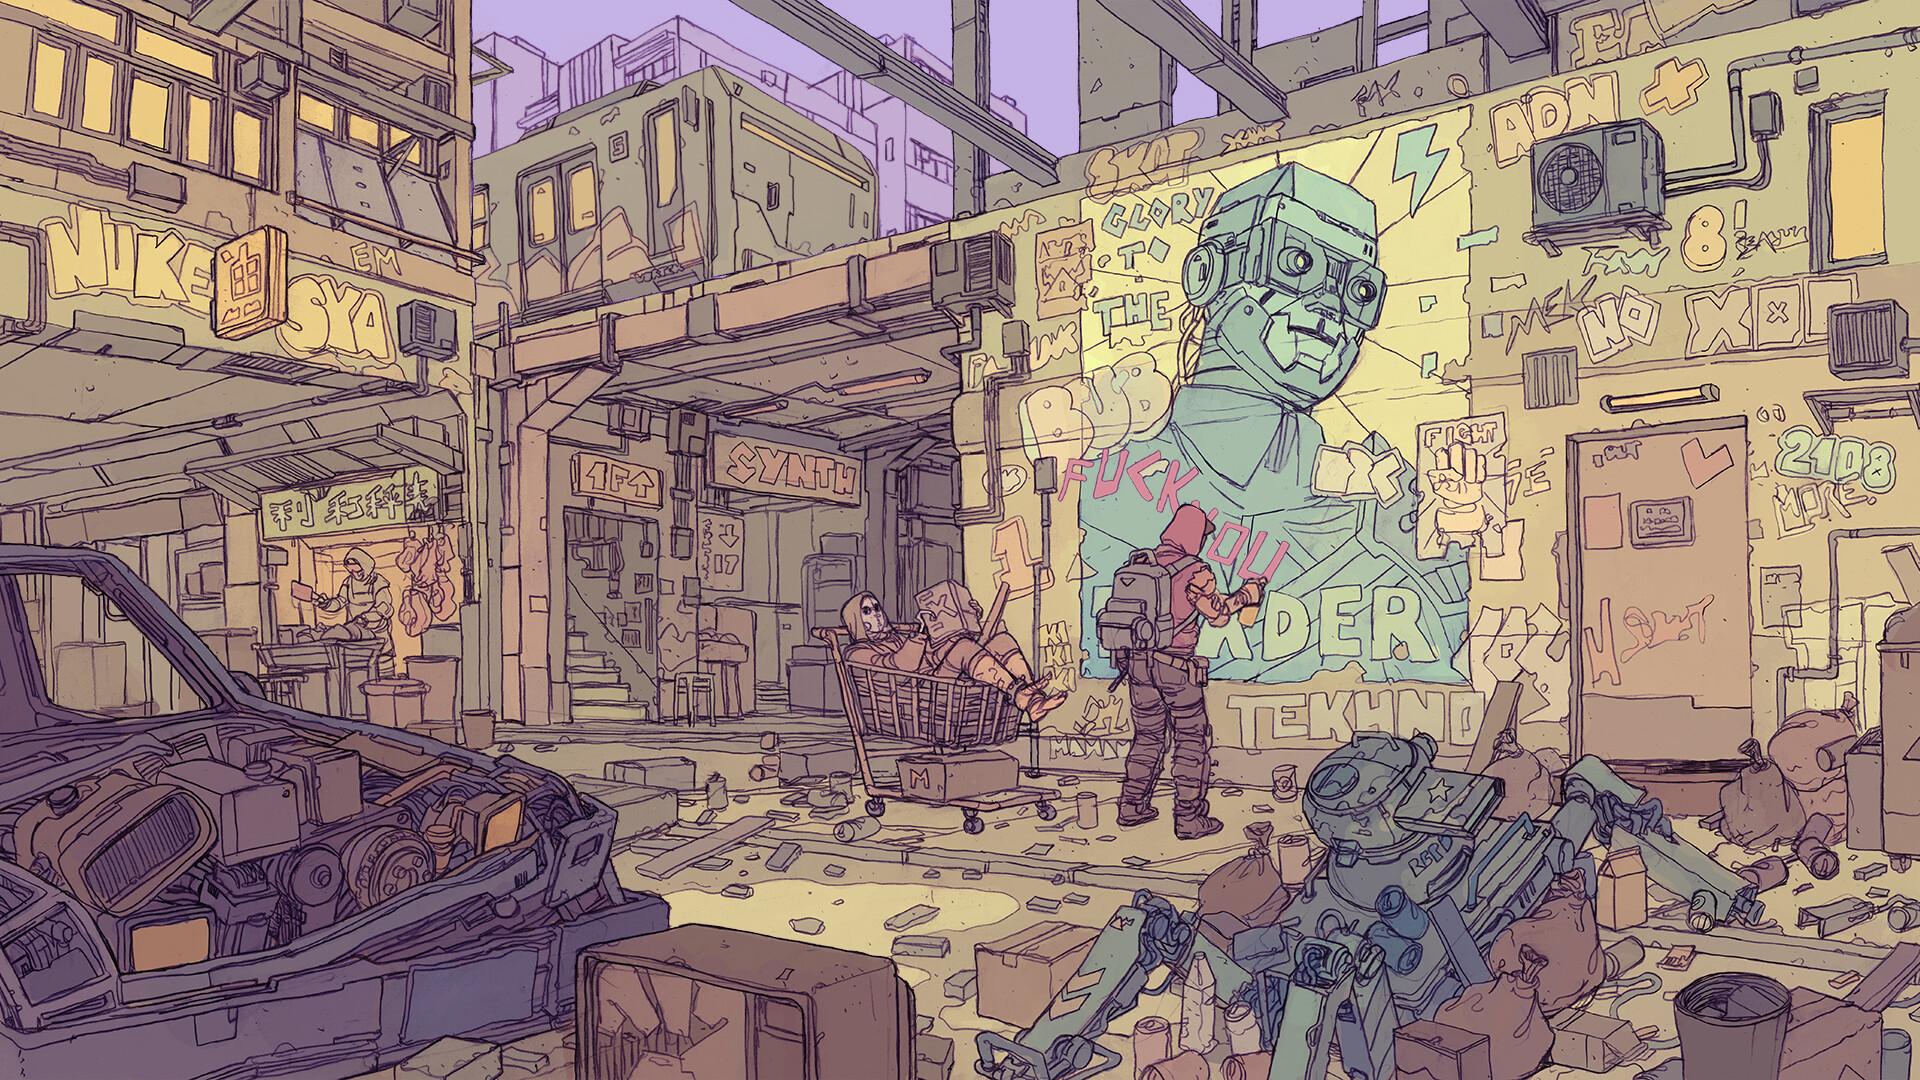 death-burger-under-rail-v12.jpg - Cyberpunk 2077